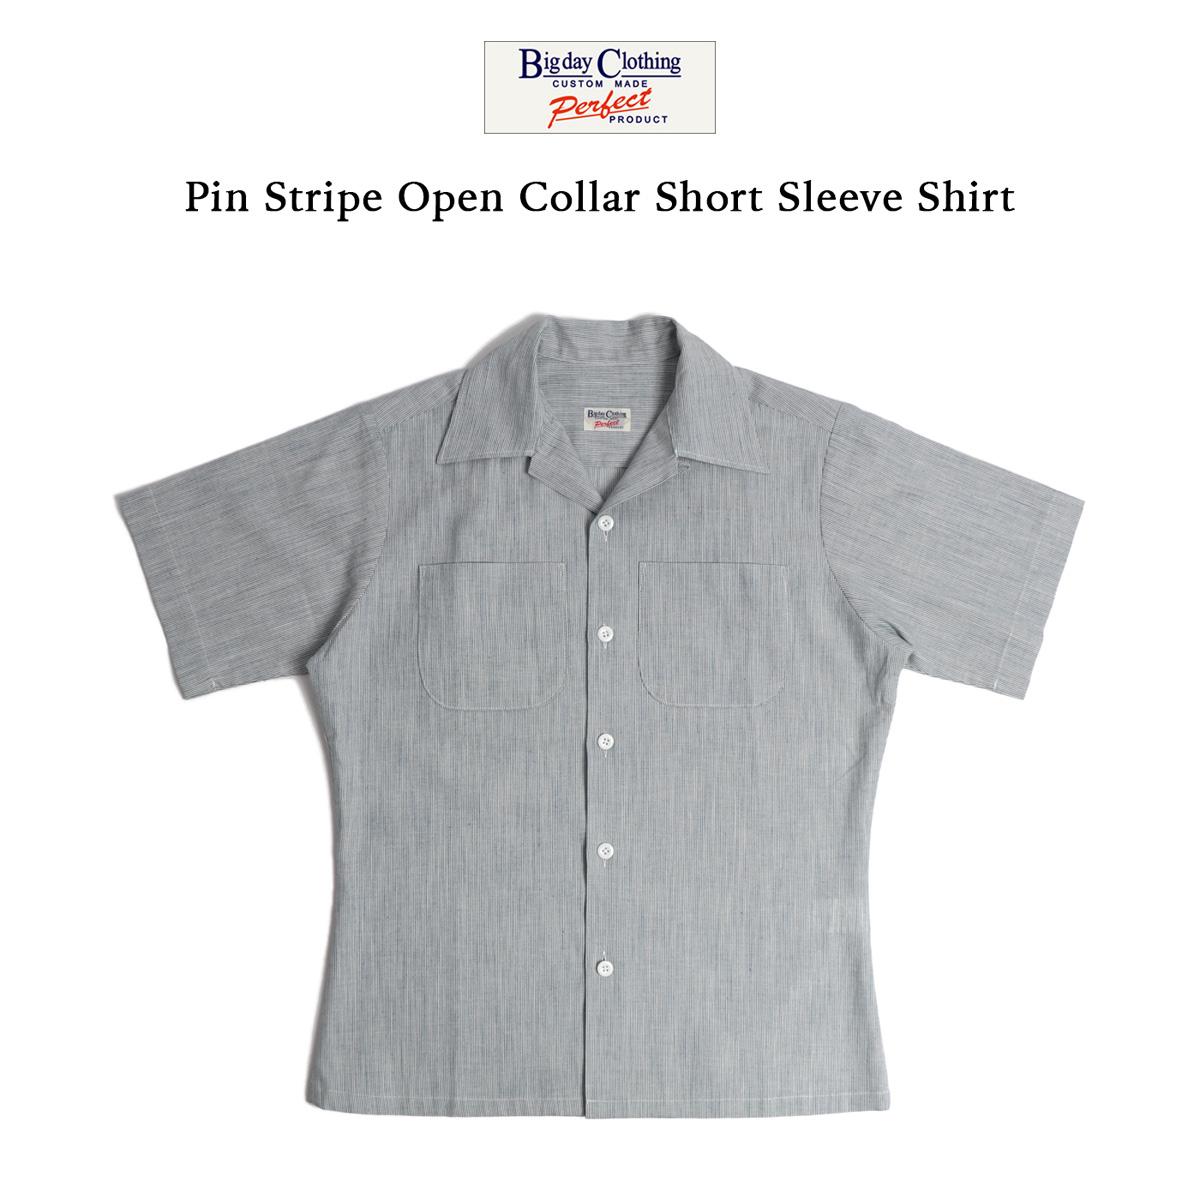 BIG DAY ビッグデイ シャツ 半袖 メンズ ライトウェイトオープンカラー半袖シャツ ピンストライプ 60sスタイル 綿100% 日本製